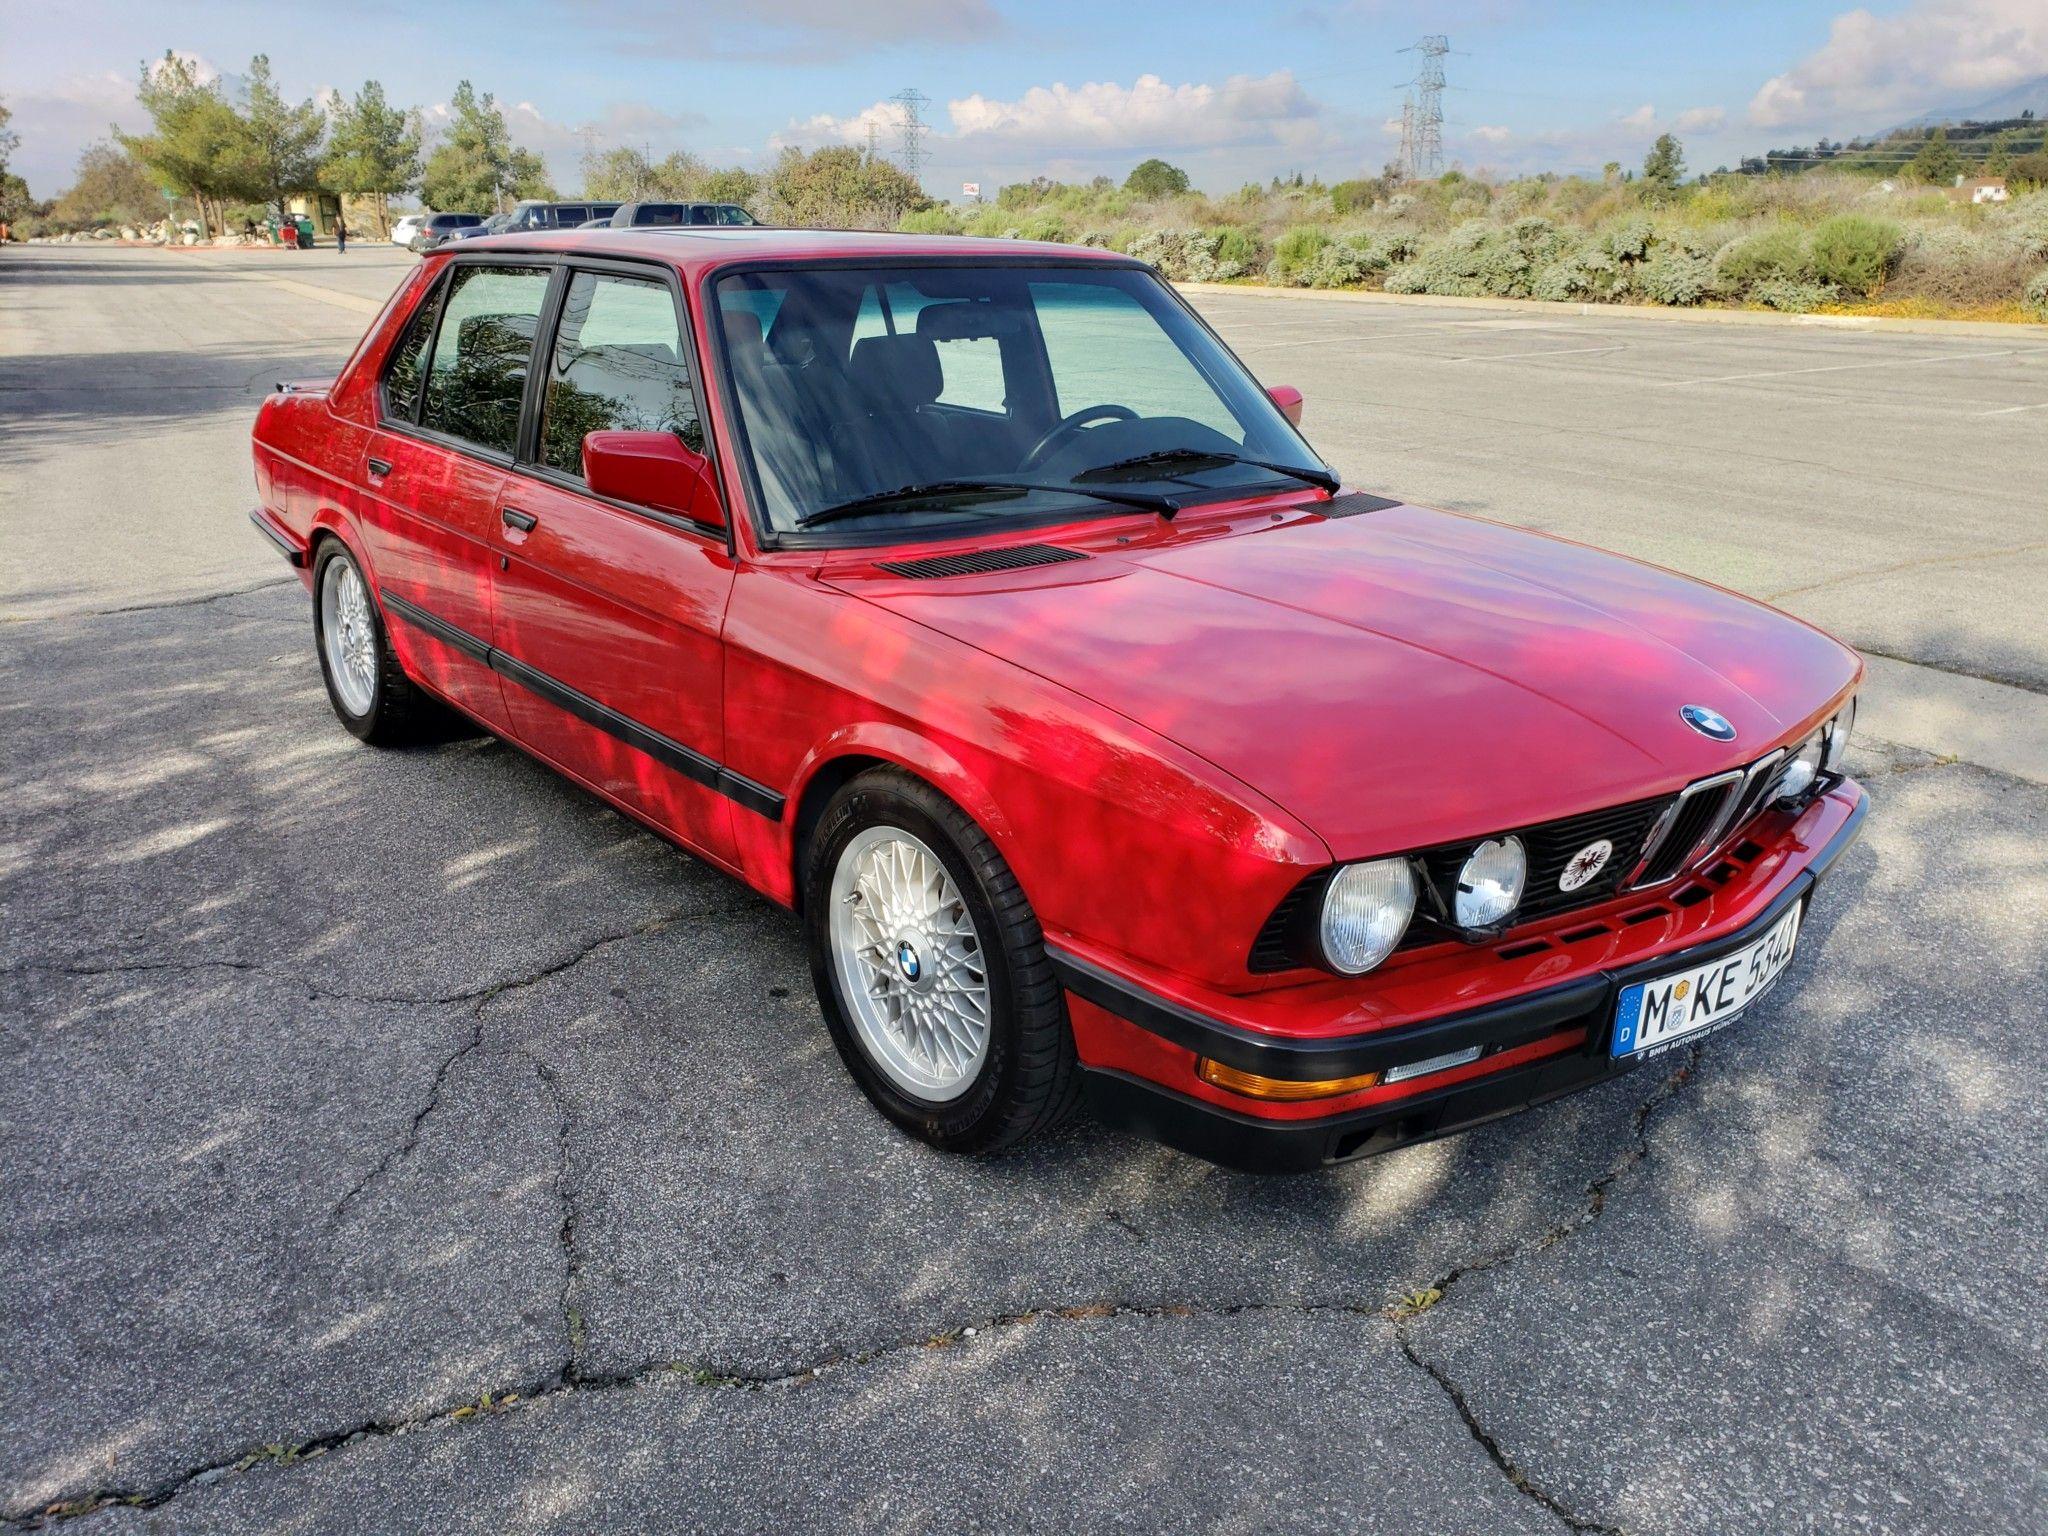 S38 Powered 1987 Bmw 535is 5 Speed Bmw Bmw E28 Classic Cars Online